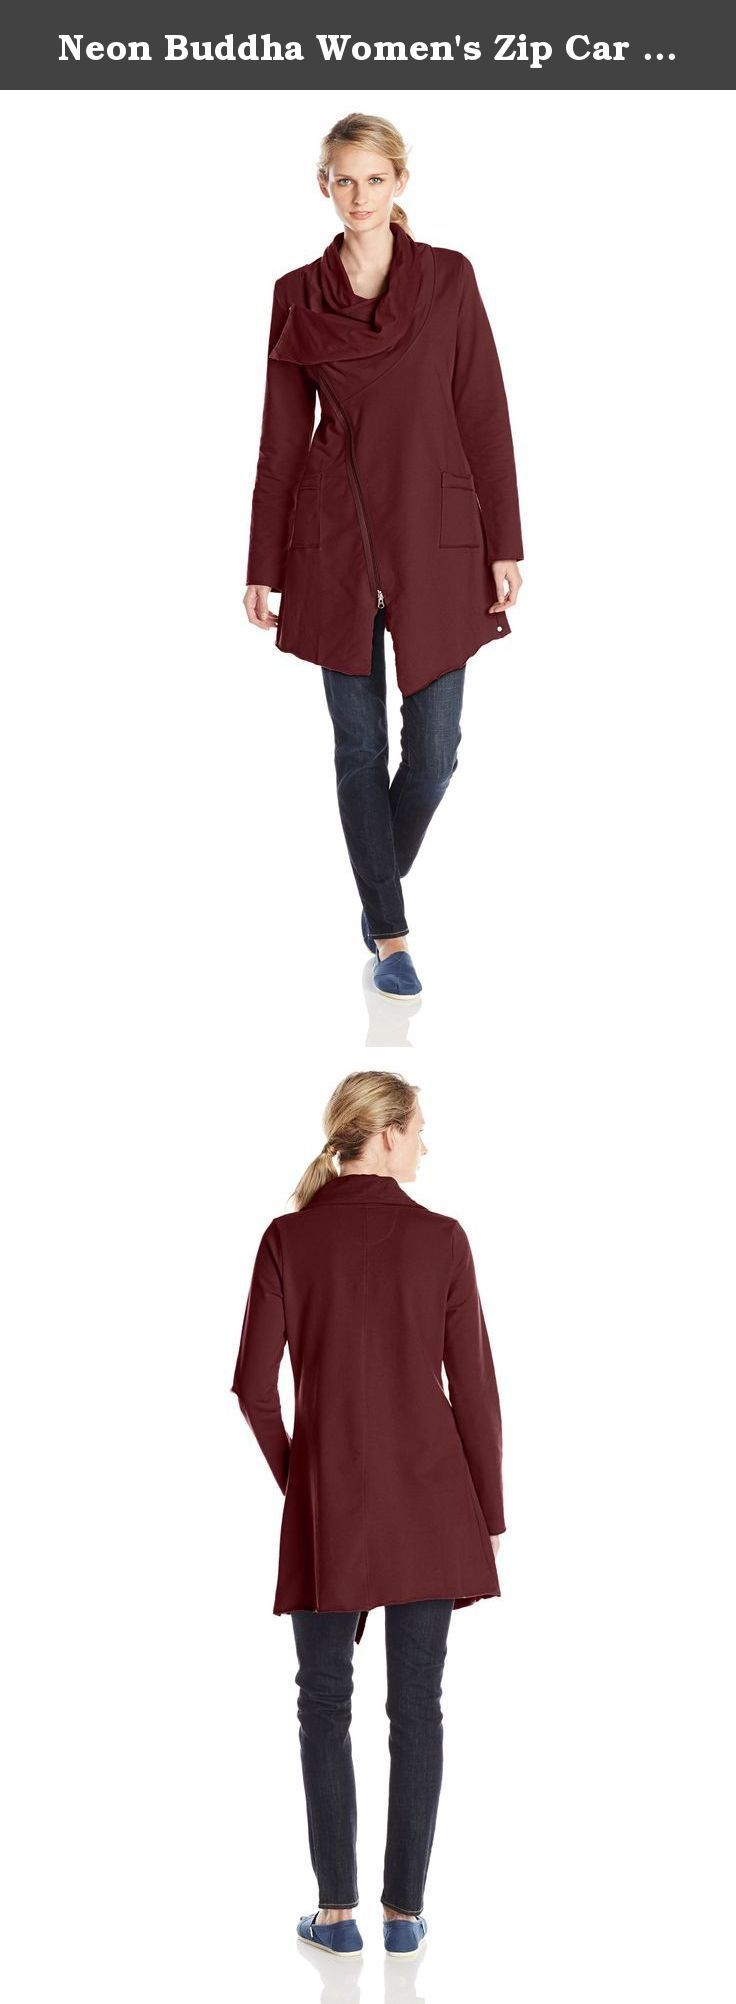 Neon Buddha Women's Zip Car Jacket, Wine, Medium. Zip car jacket which is very comfortable and trendy to wear.